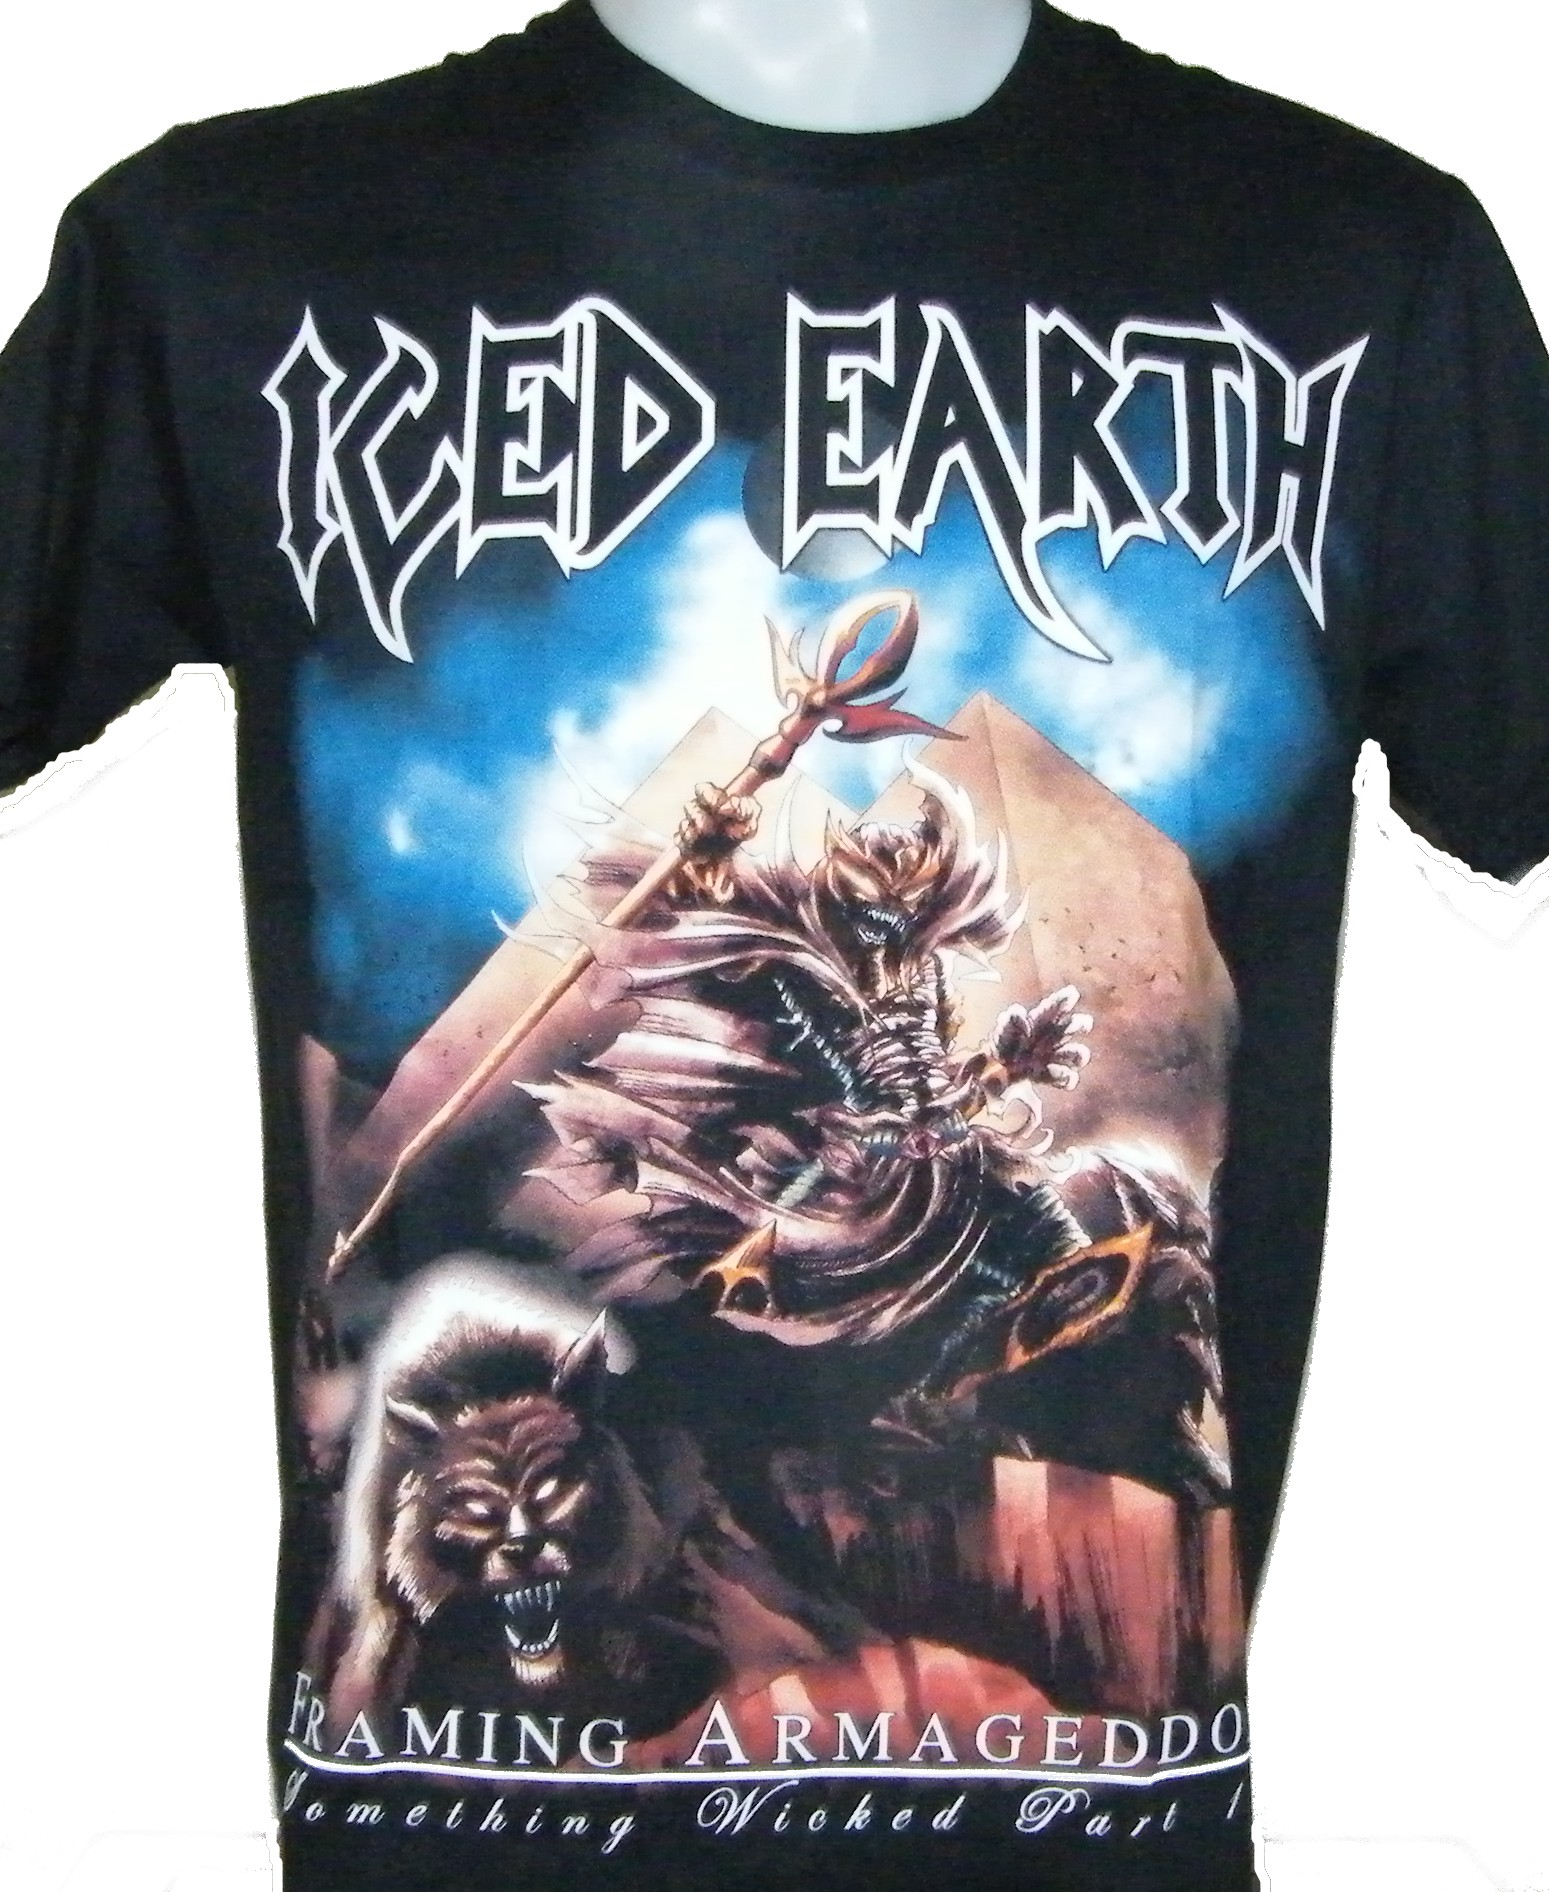 Iced Earth t-shirt Framing Armageddon size M – RoxxBKK